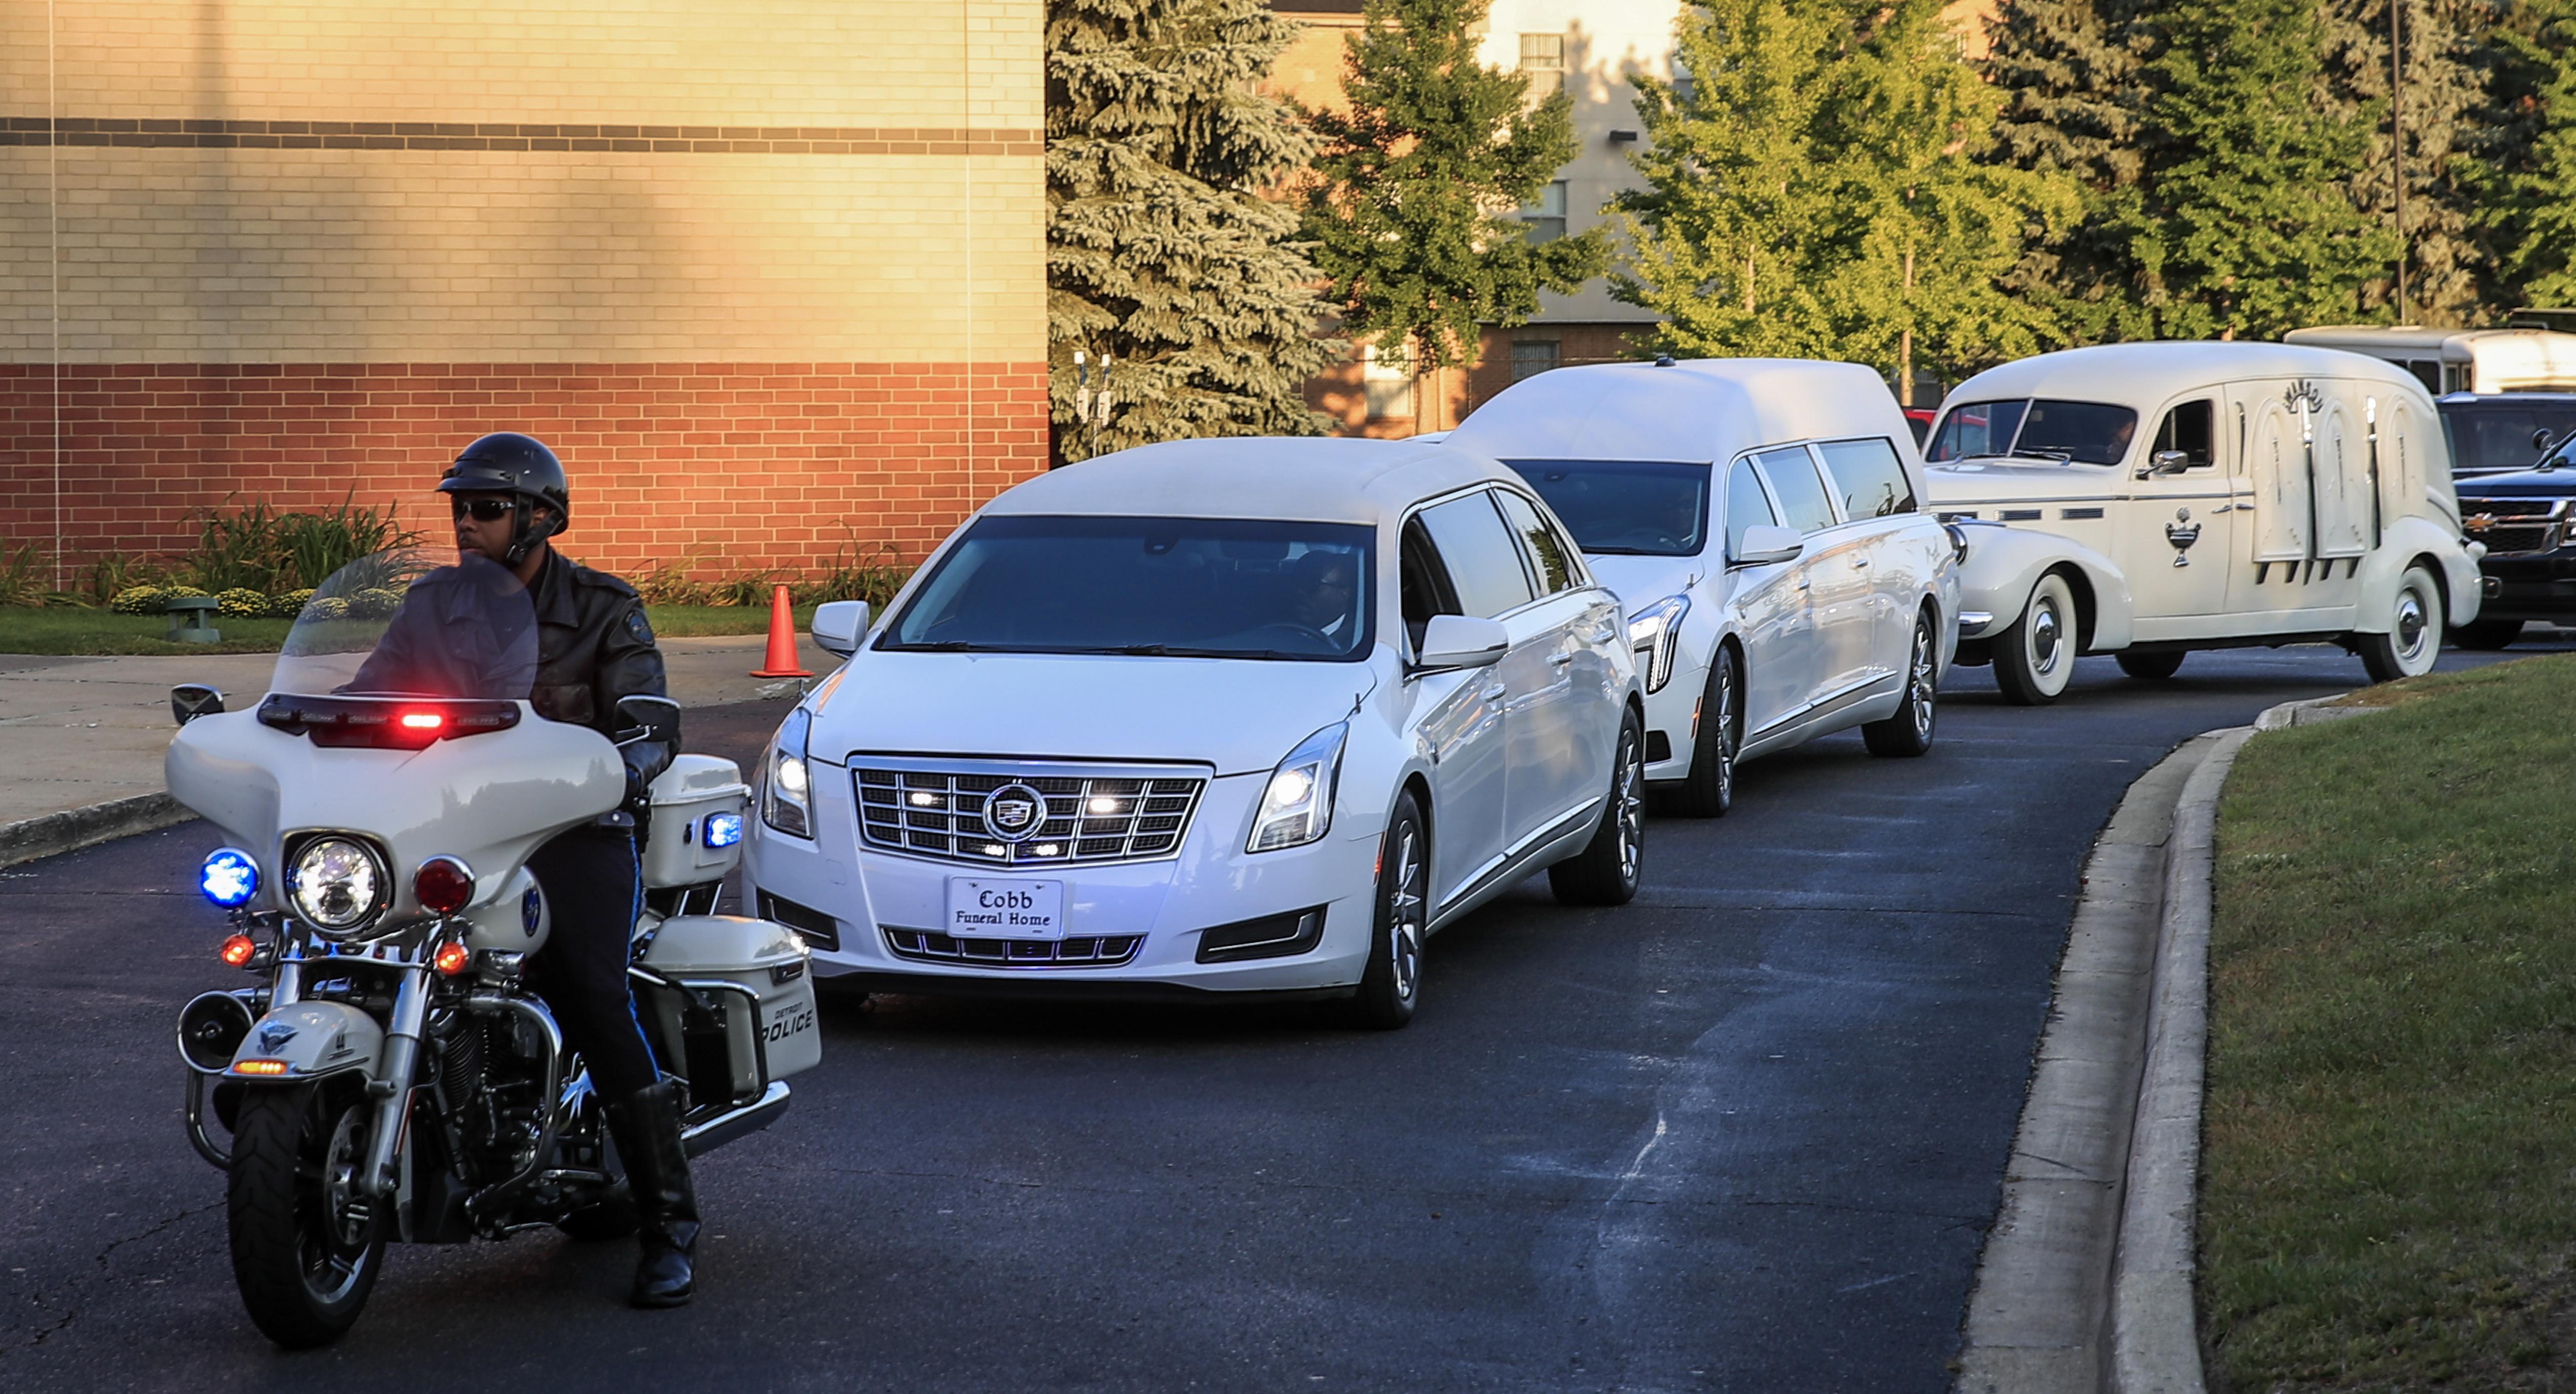 Veličanstveni pogreb Arethe Franklin